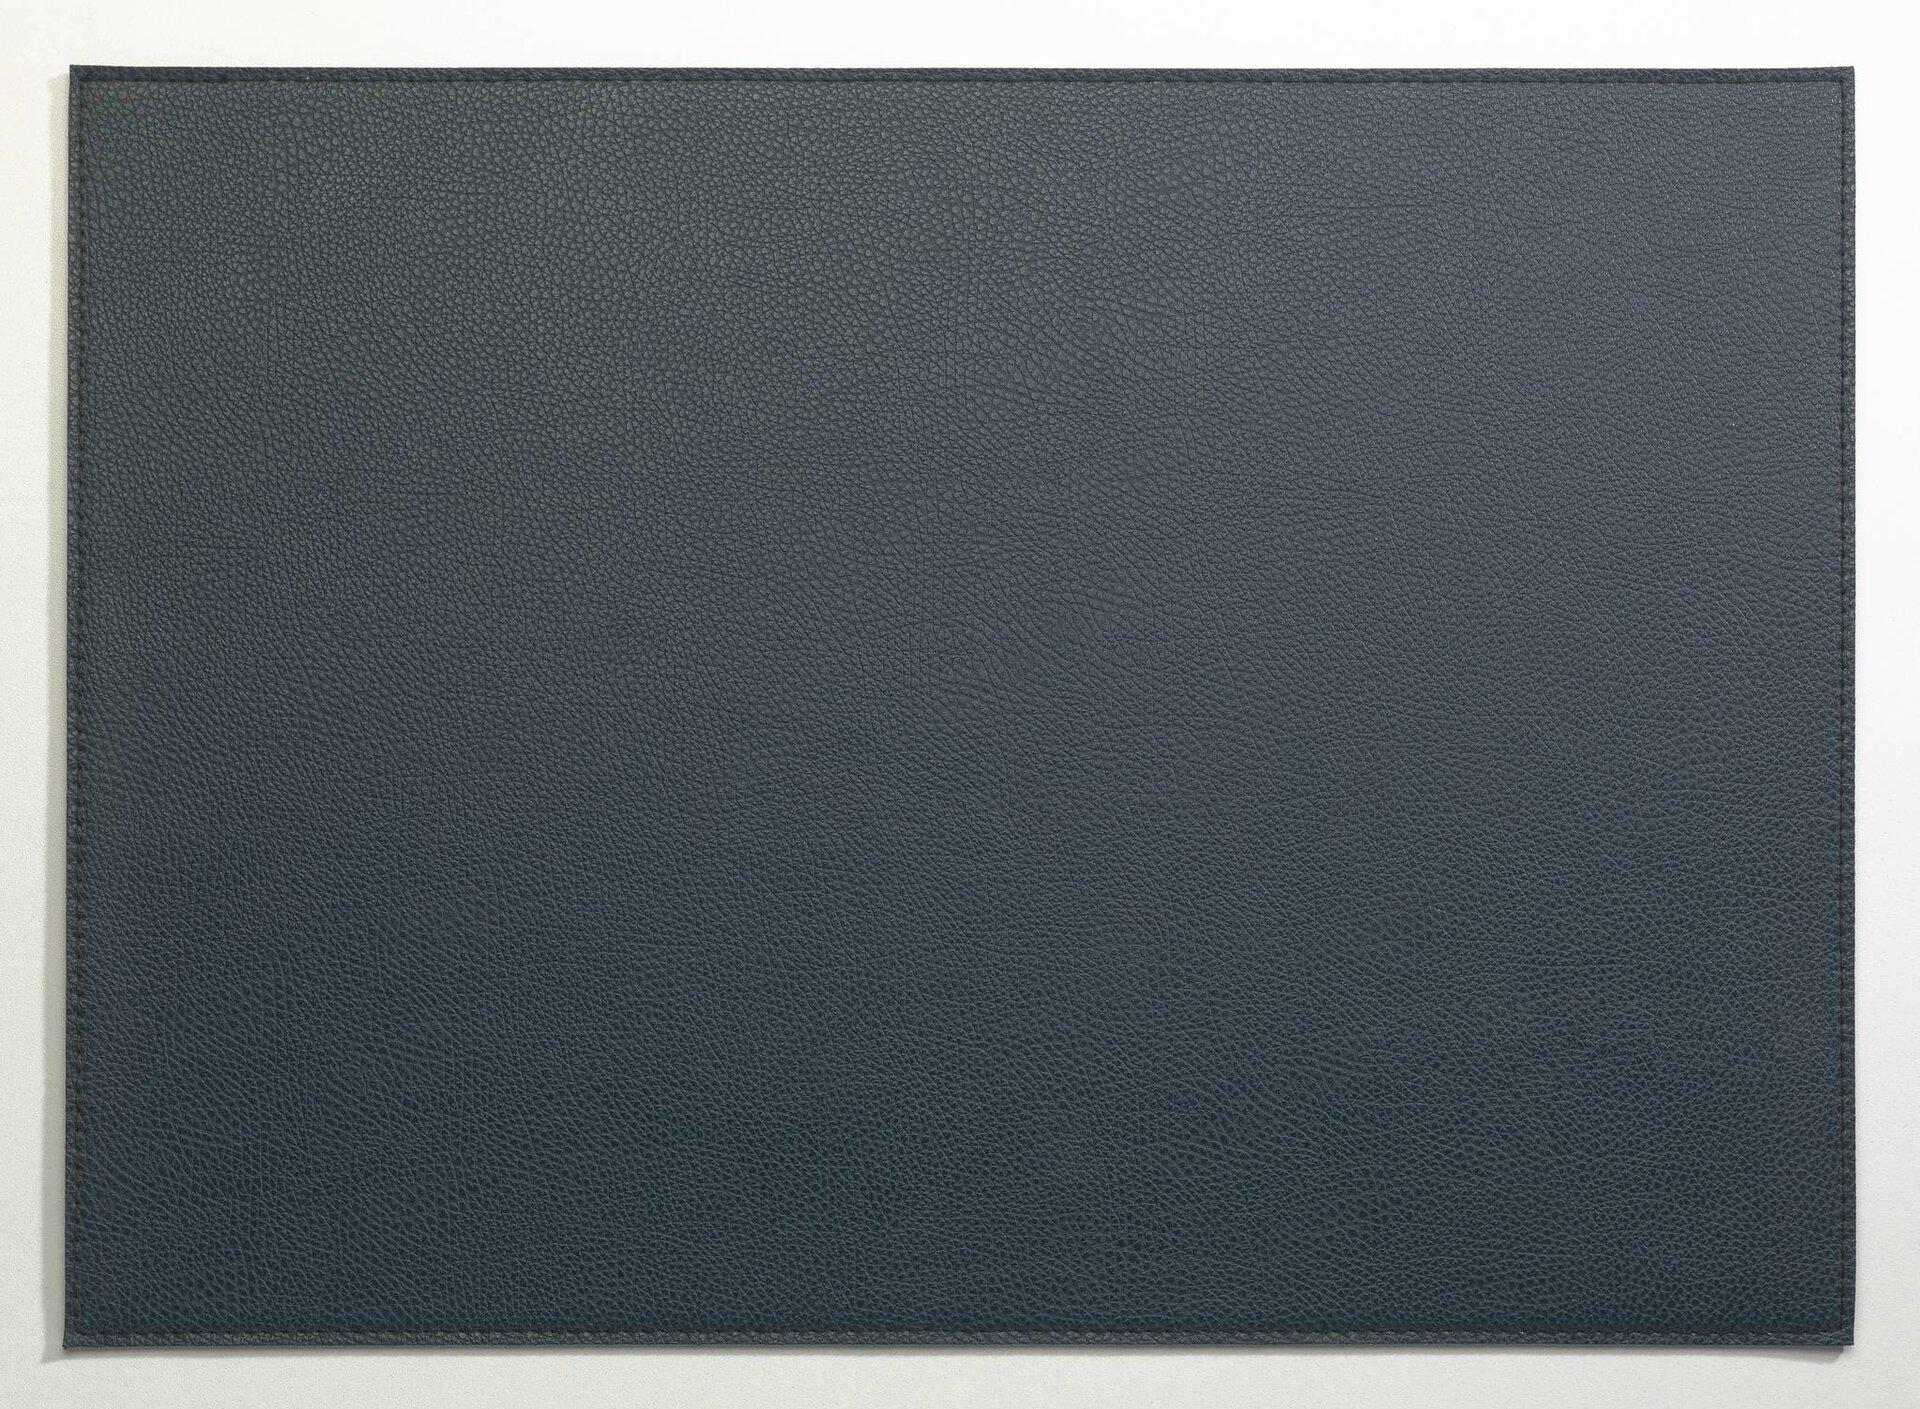 Tischset 174182 Casa Nova Casa Nova Kunststoff Blau